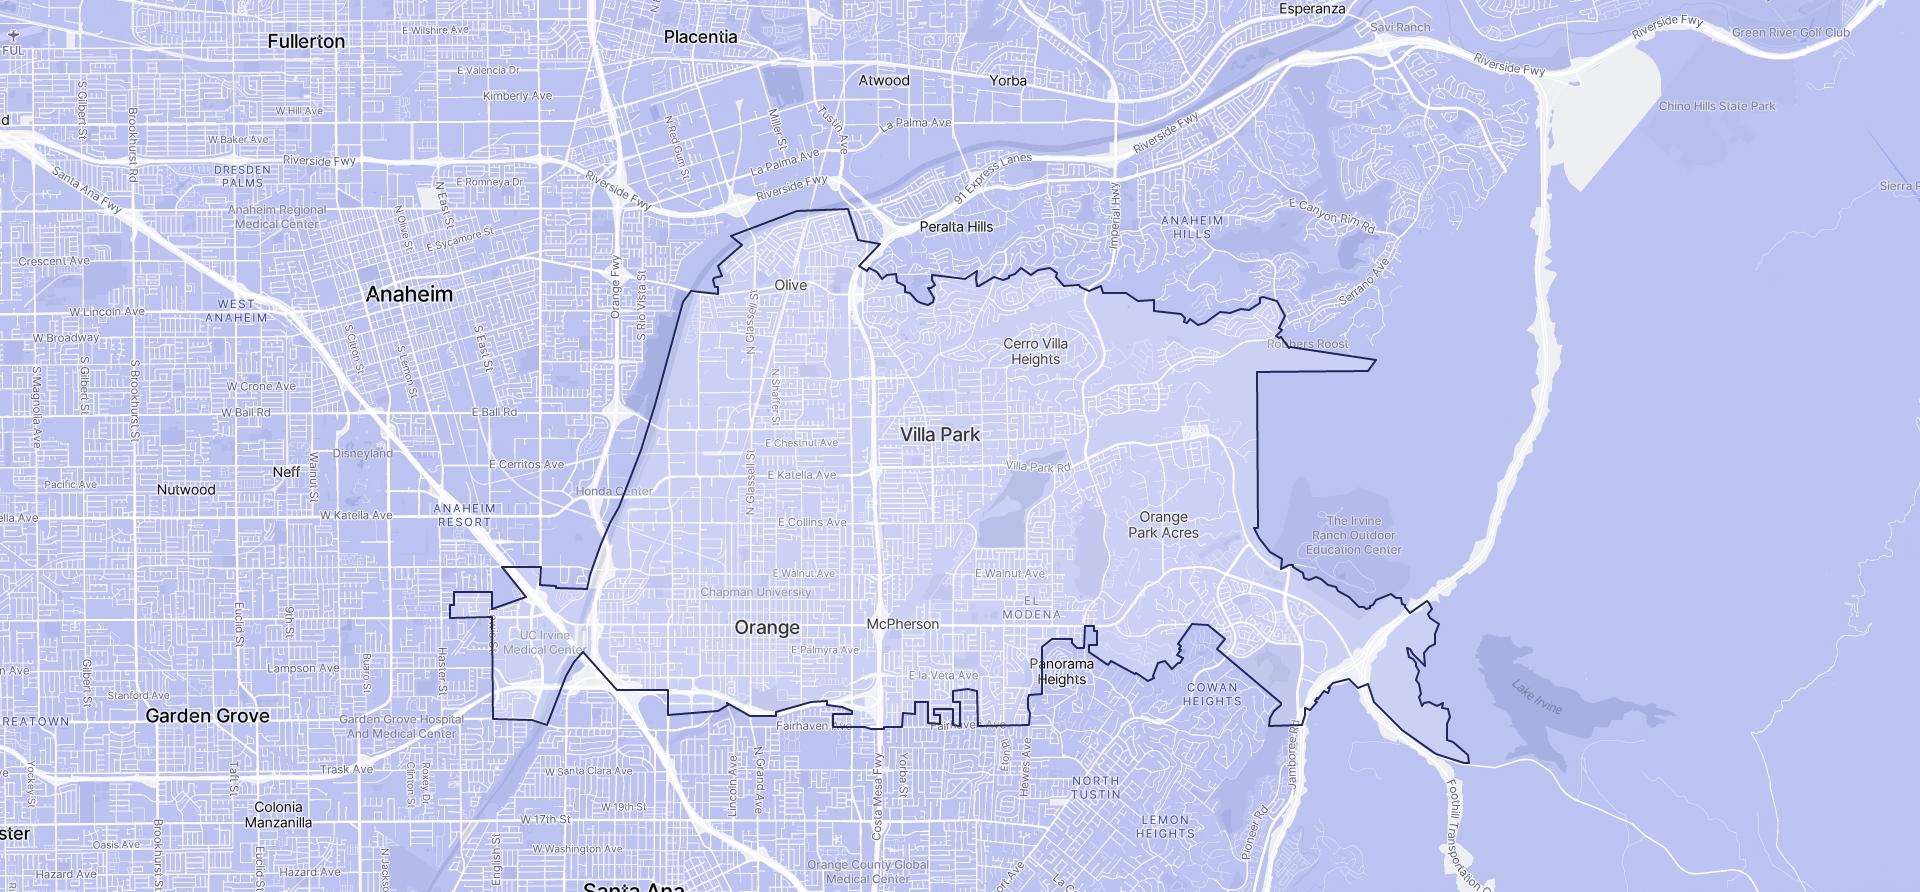 Image of Orange boundaries on a map.